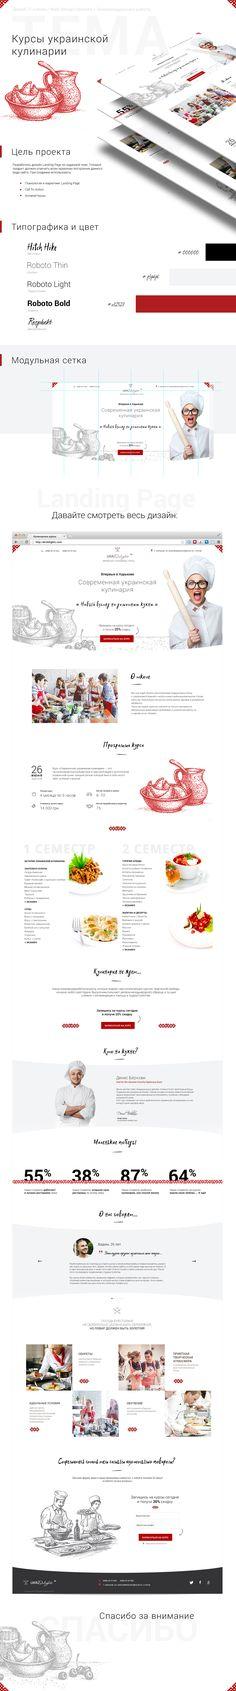 "Landing Page ""Курсы украинской кулинарии"" on Behance"